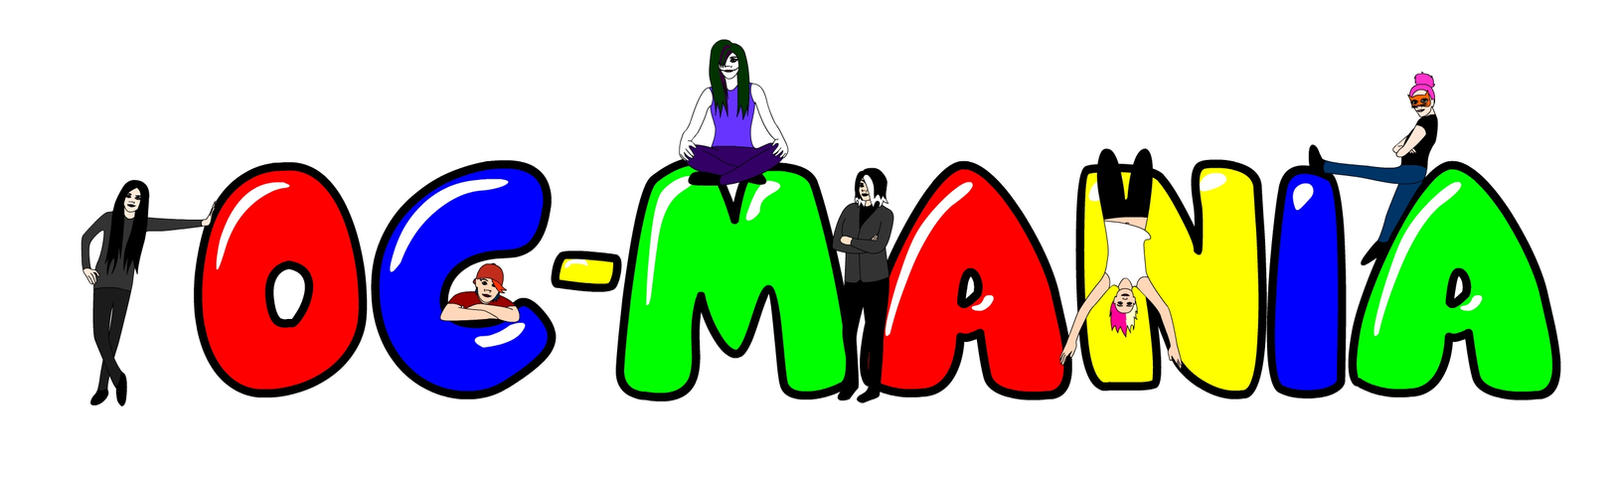 OC-MANIA by jokerismyname